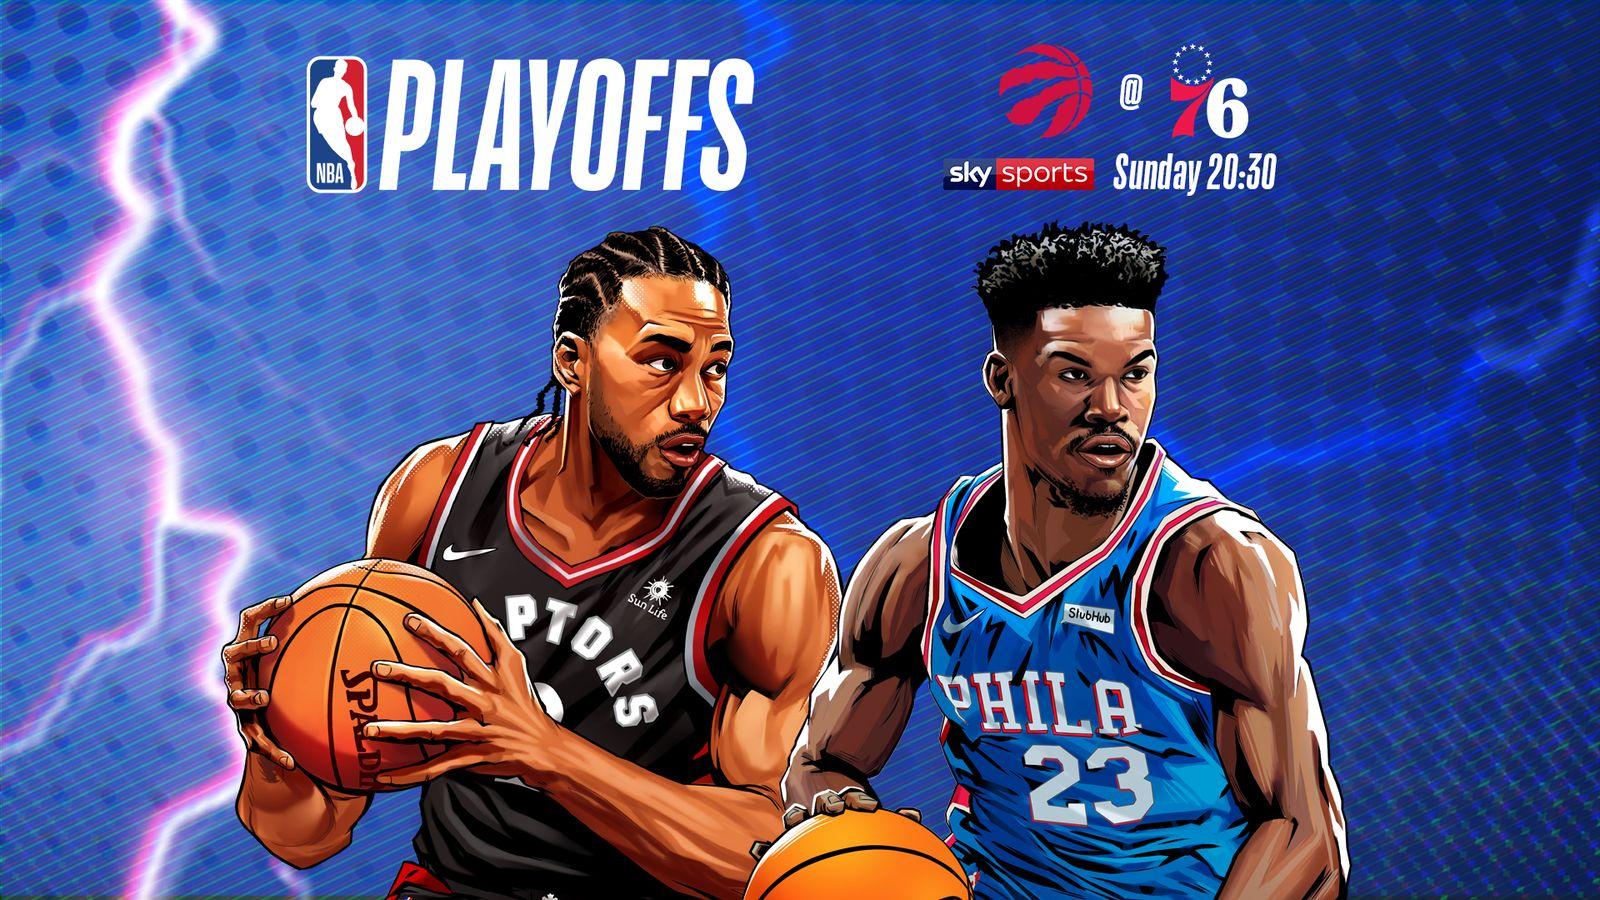 LIVE STREAM: Watch Toronto Raptors @ Philadelphia 76ers Game 4 live on skysports.com and Sky Sports app